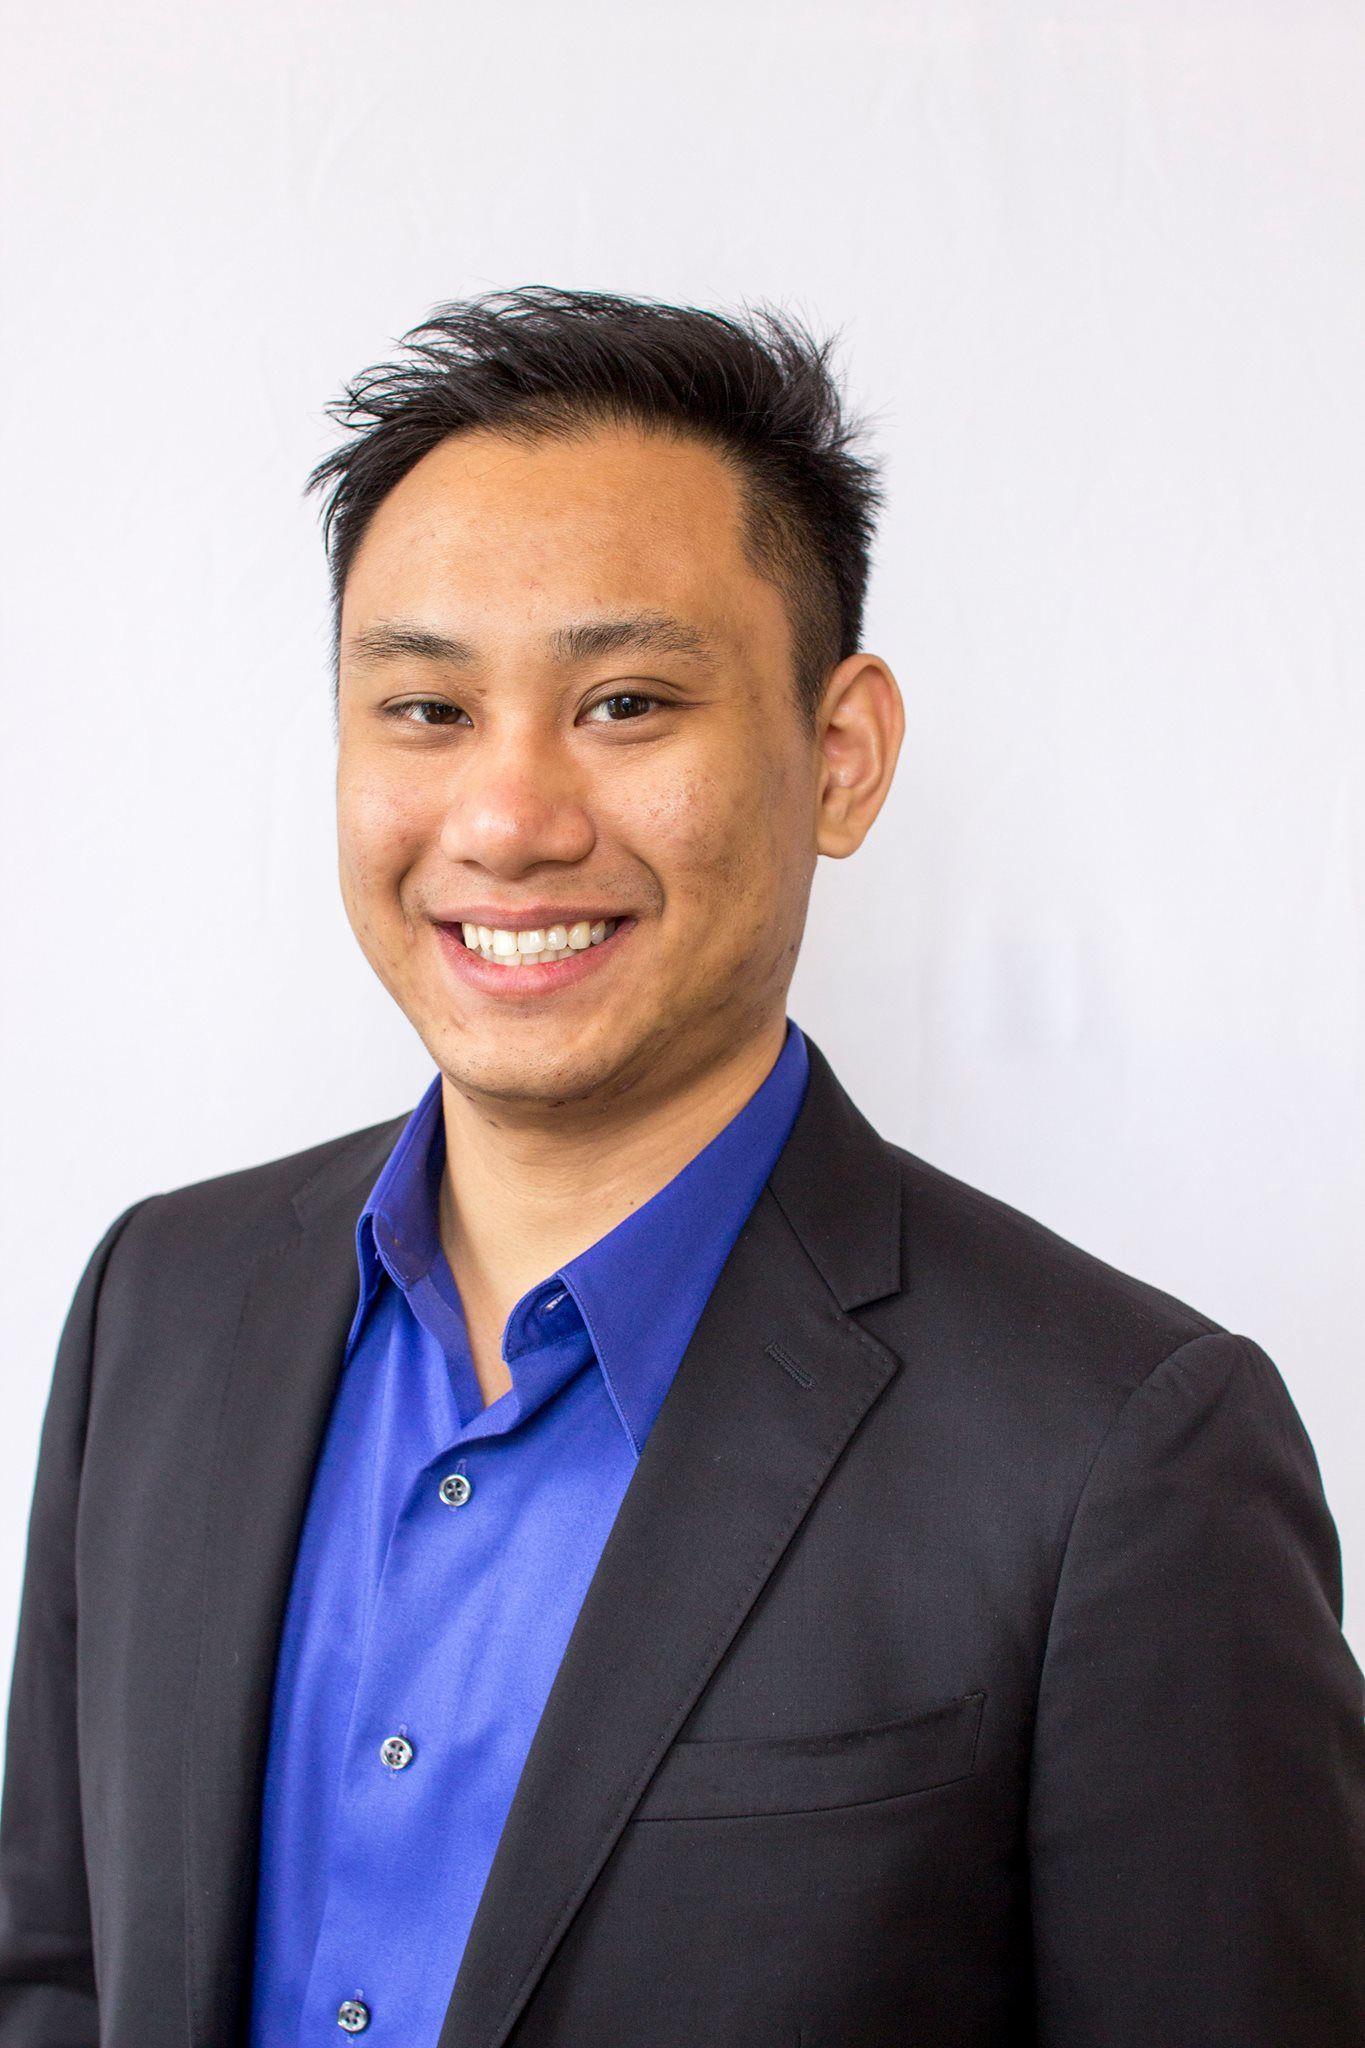 Dr. Steven Huynh